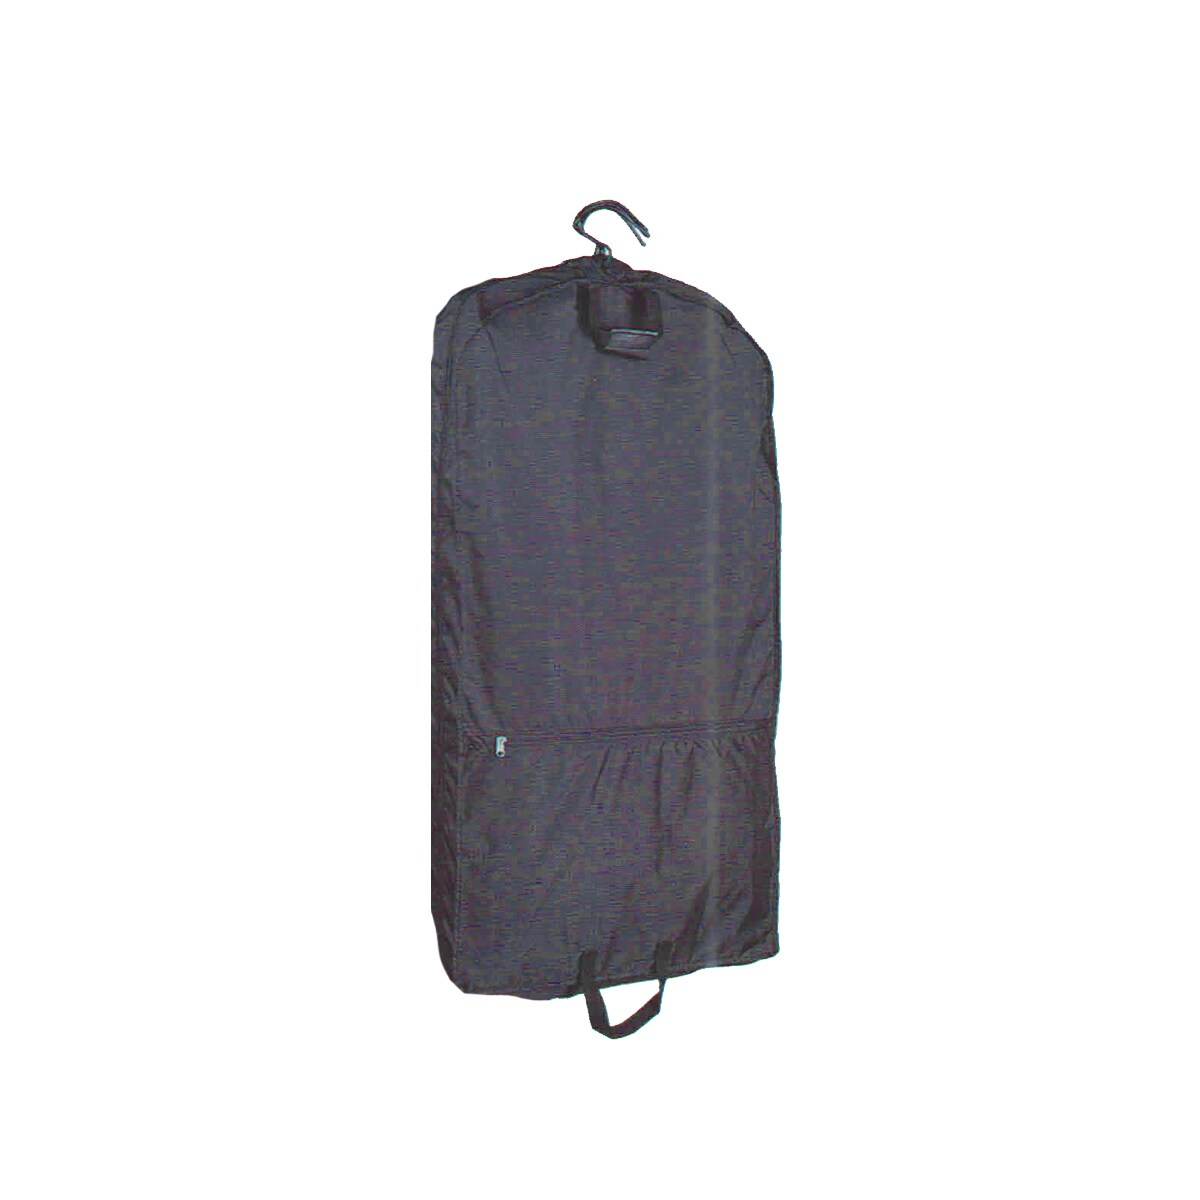 GOOD HOPE BAGS 40-inch Nylon Garment Cover (Black)